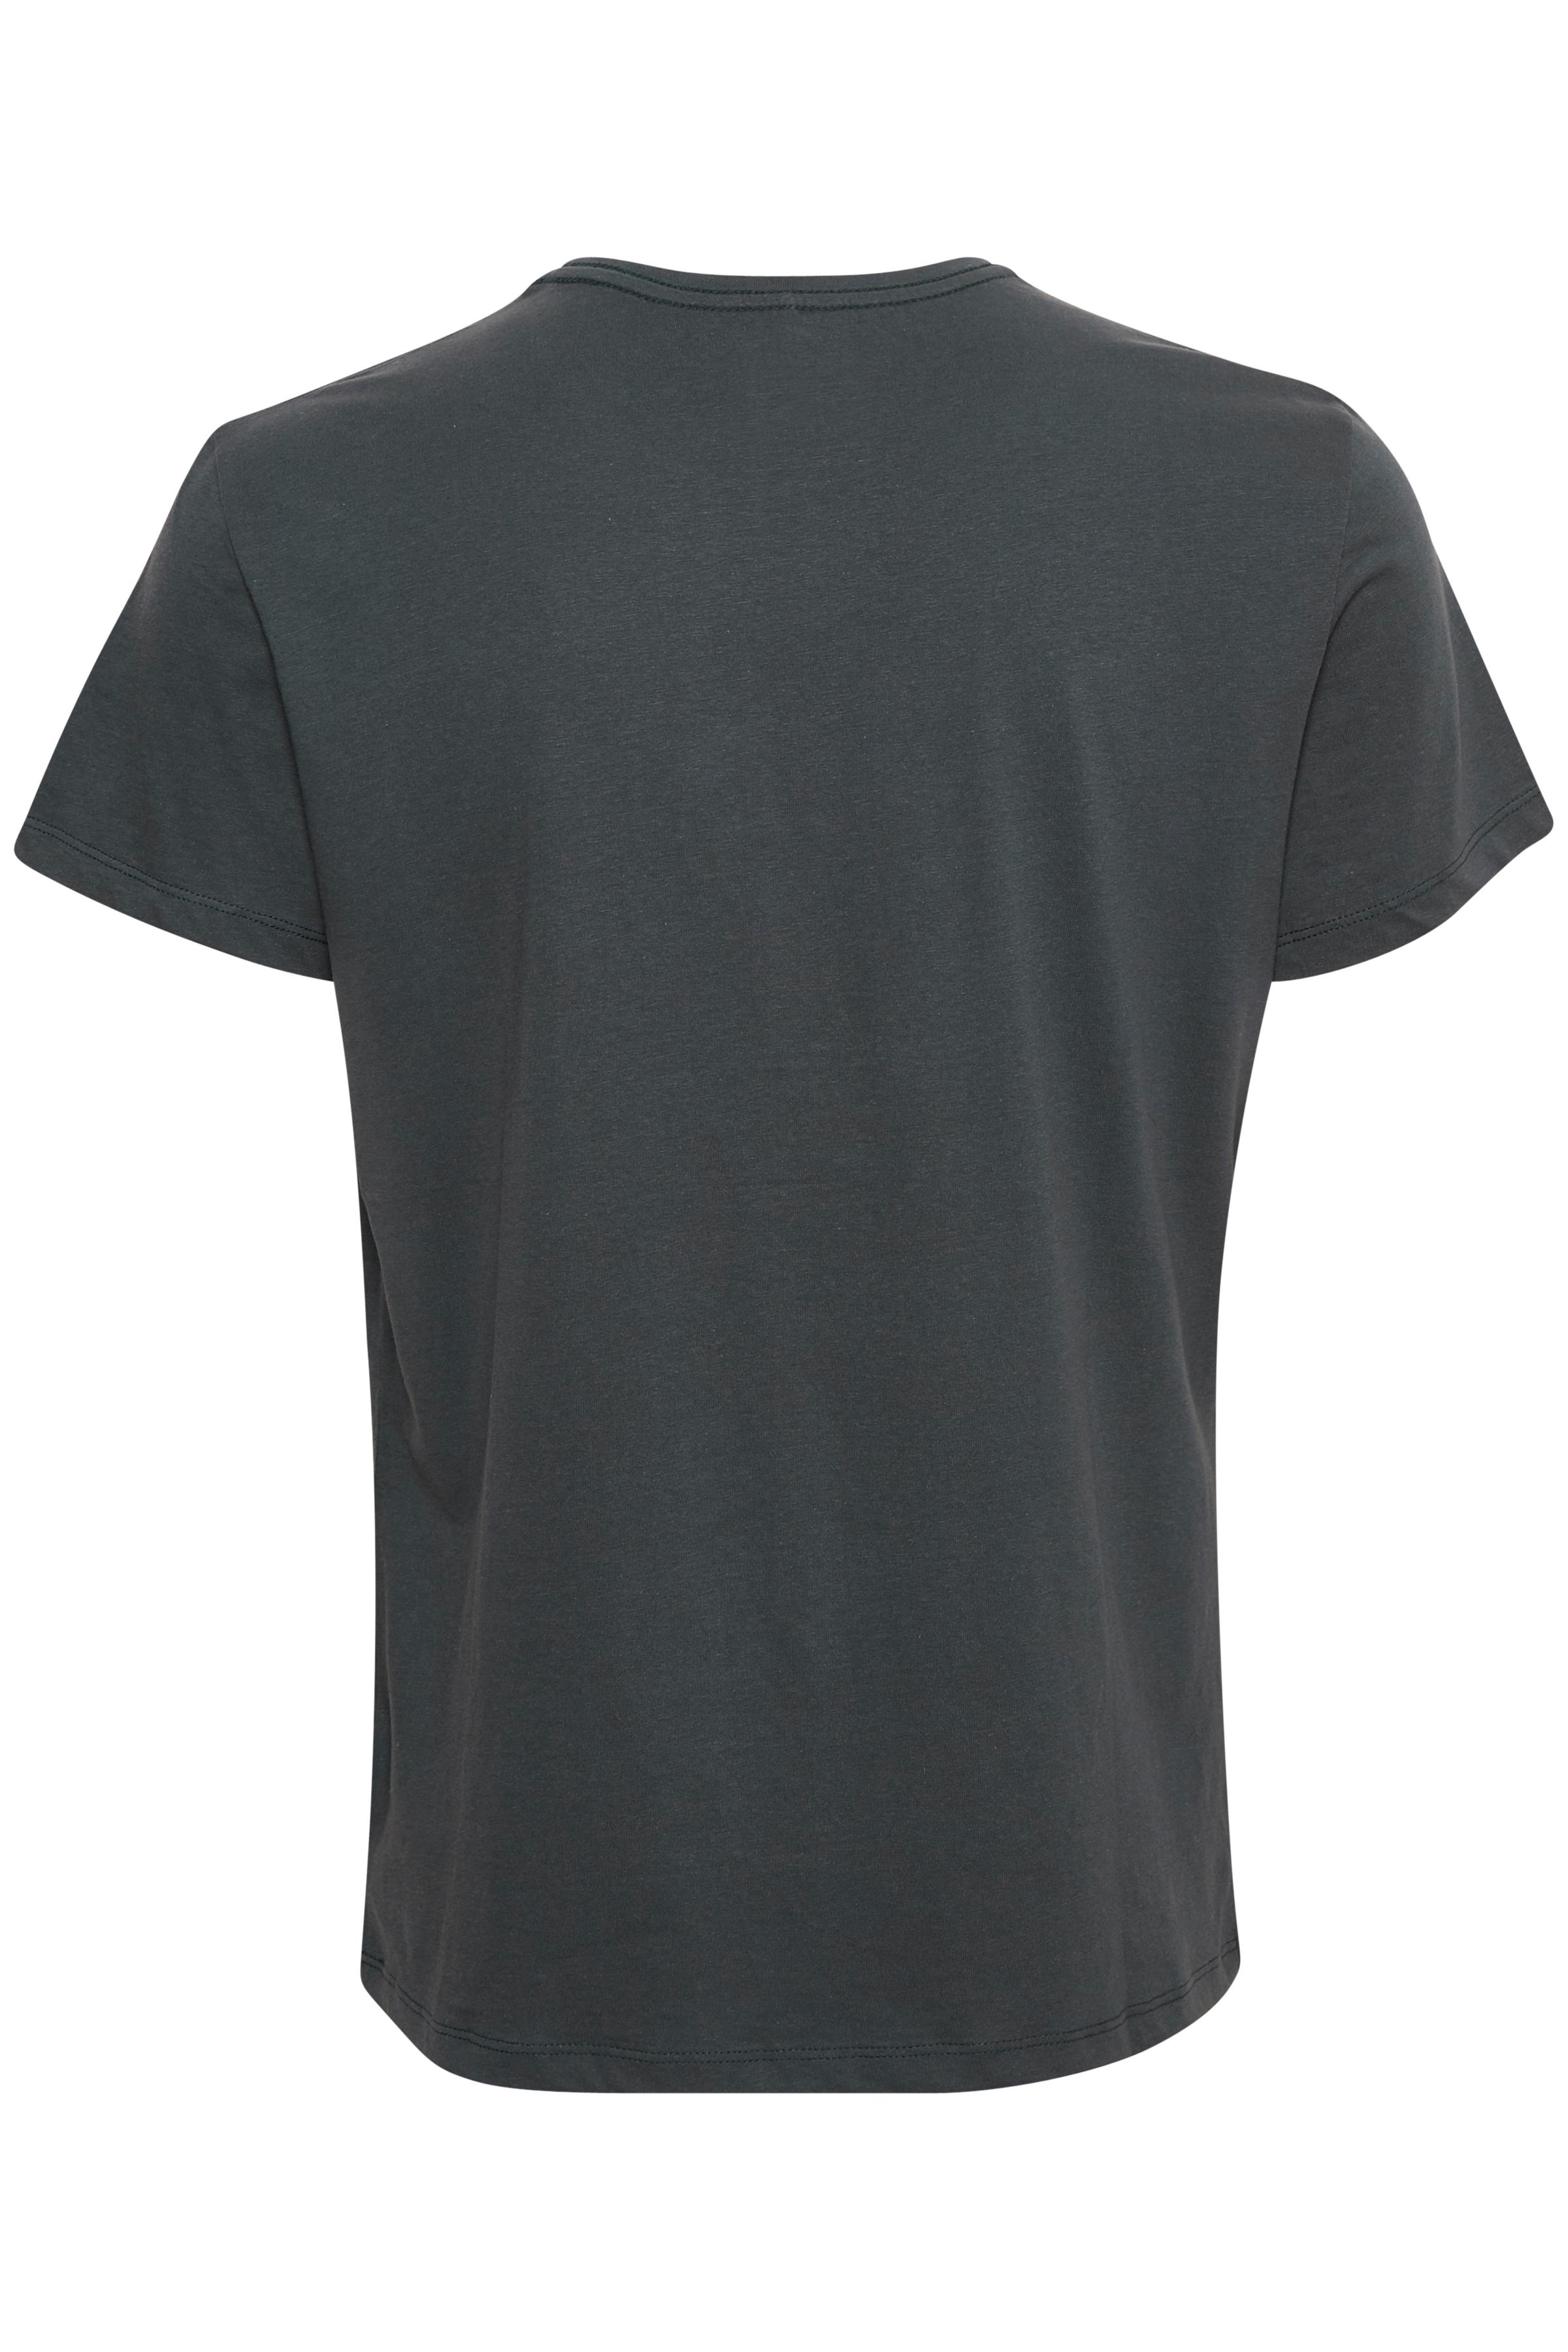 Mørk marineblå Kortærmet T-shirt fra Blend He – Køb Mørk marineblå Kortærmet T-shirt fra str. XS-3XL her